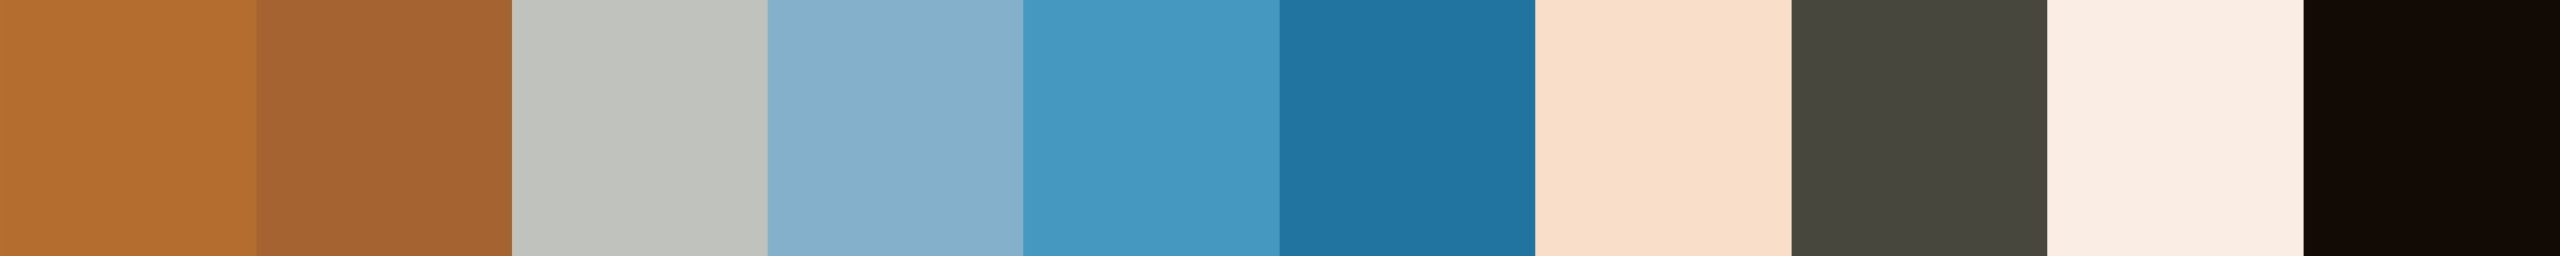 162 Miodola Color Palette